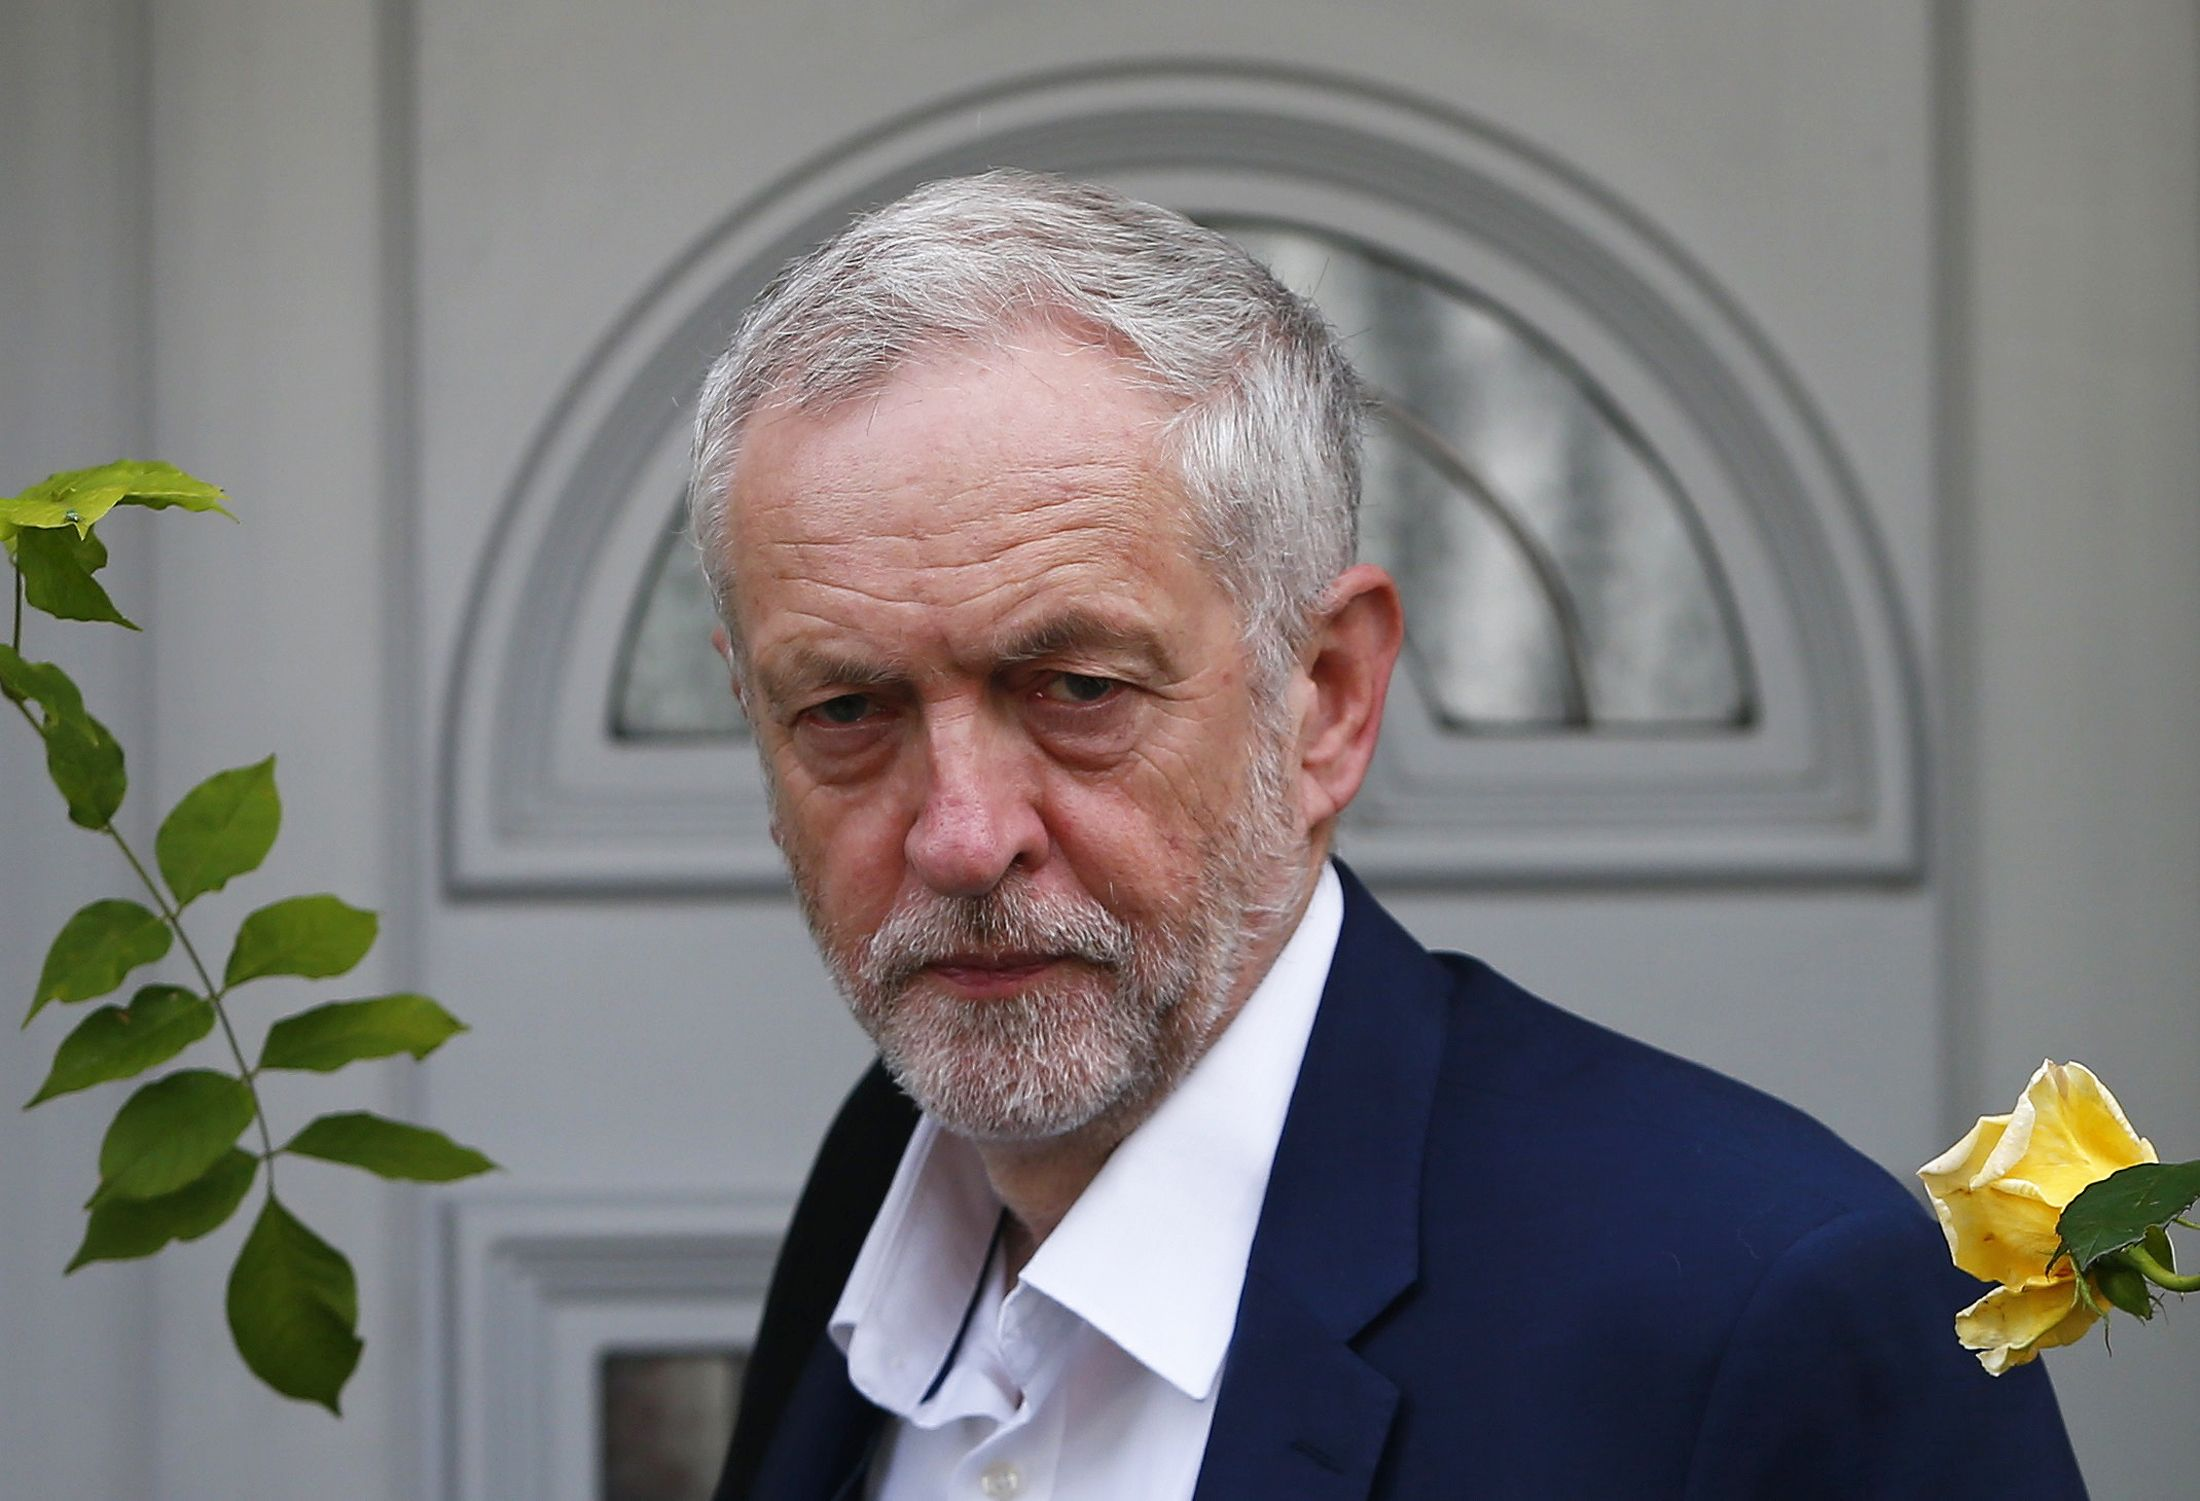 Jeremy Corbyn after the Vote of No Confidence